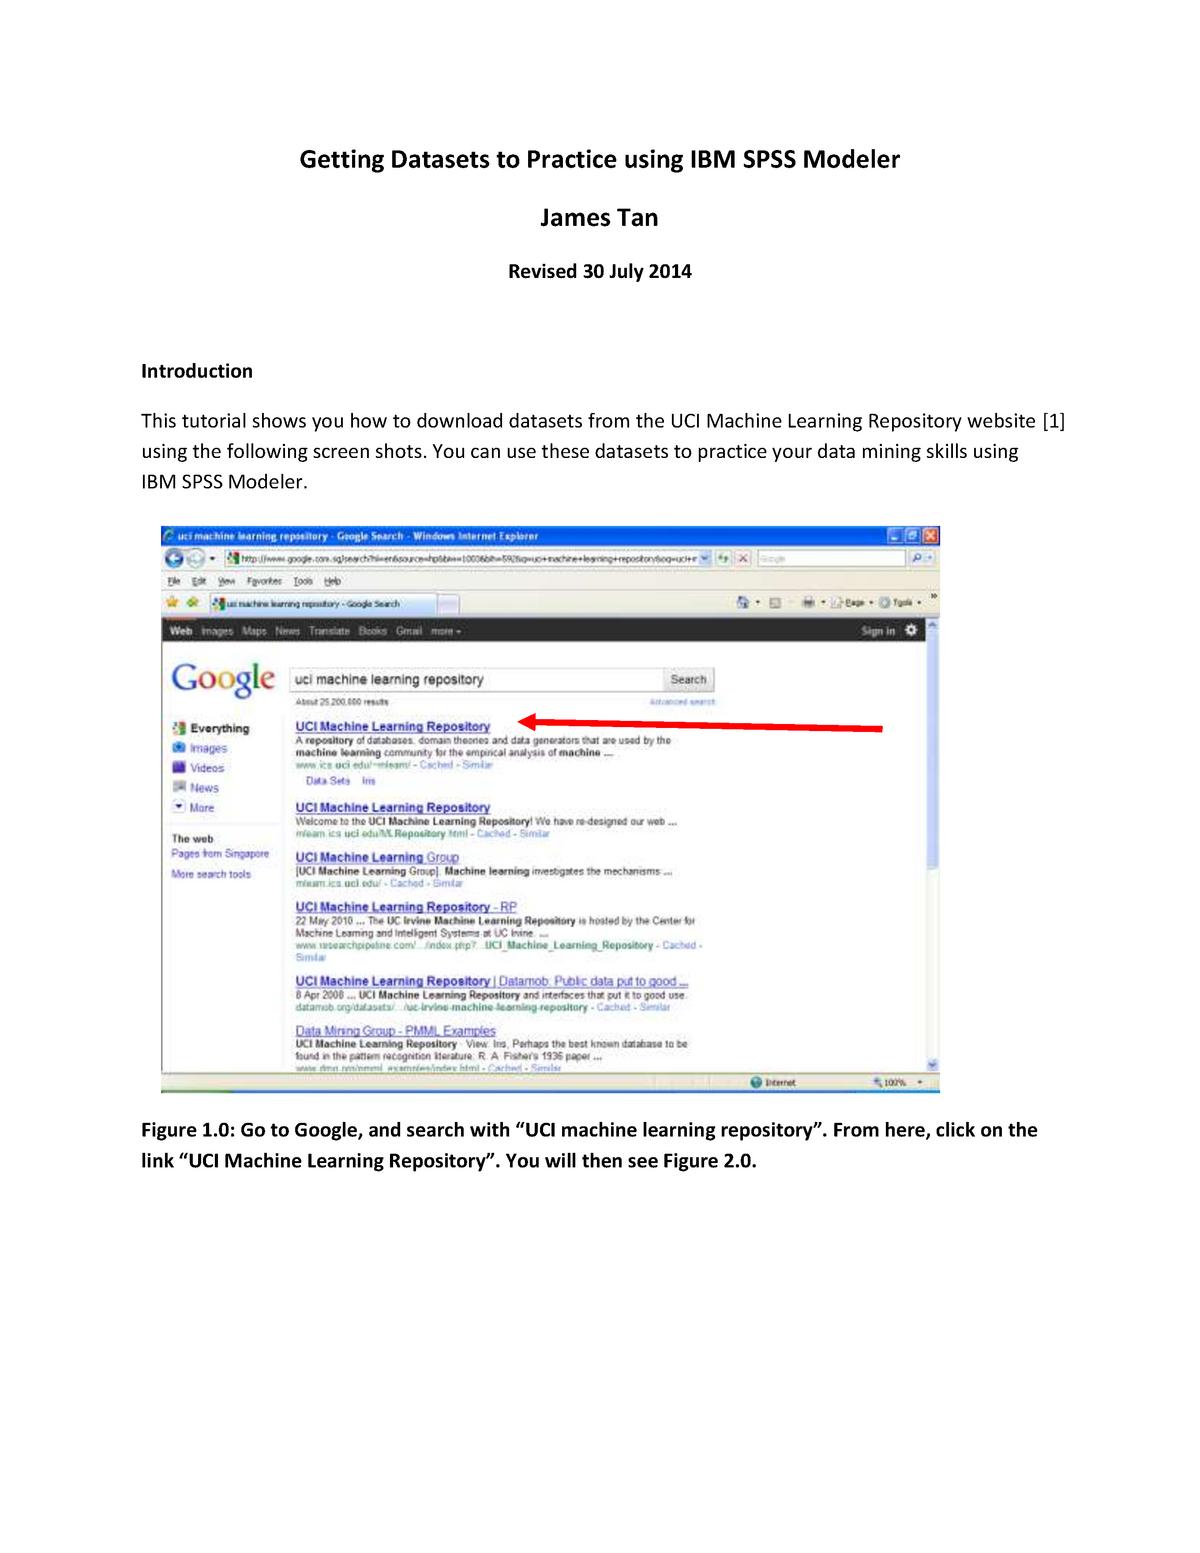 Getting datasets to practice using IBM SPSS Modeler - ANL303